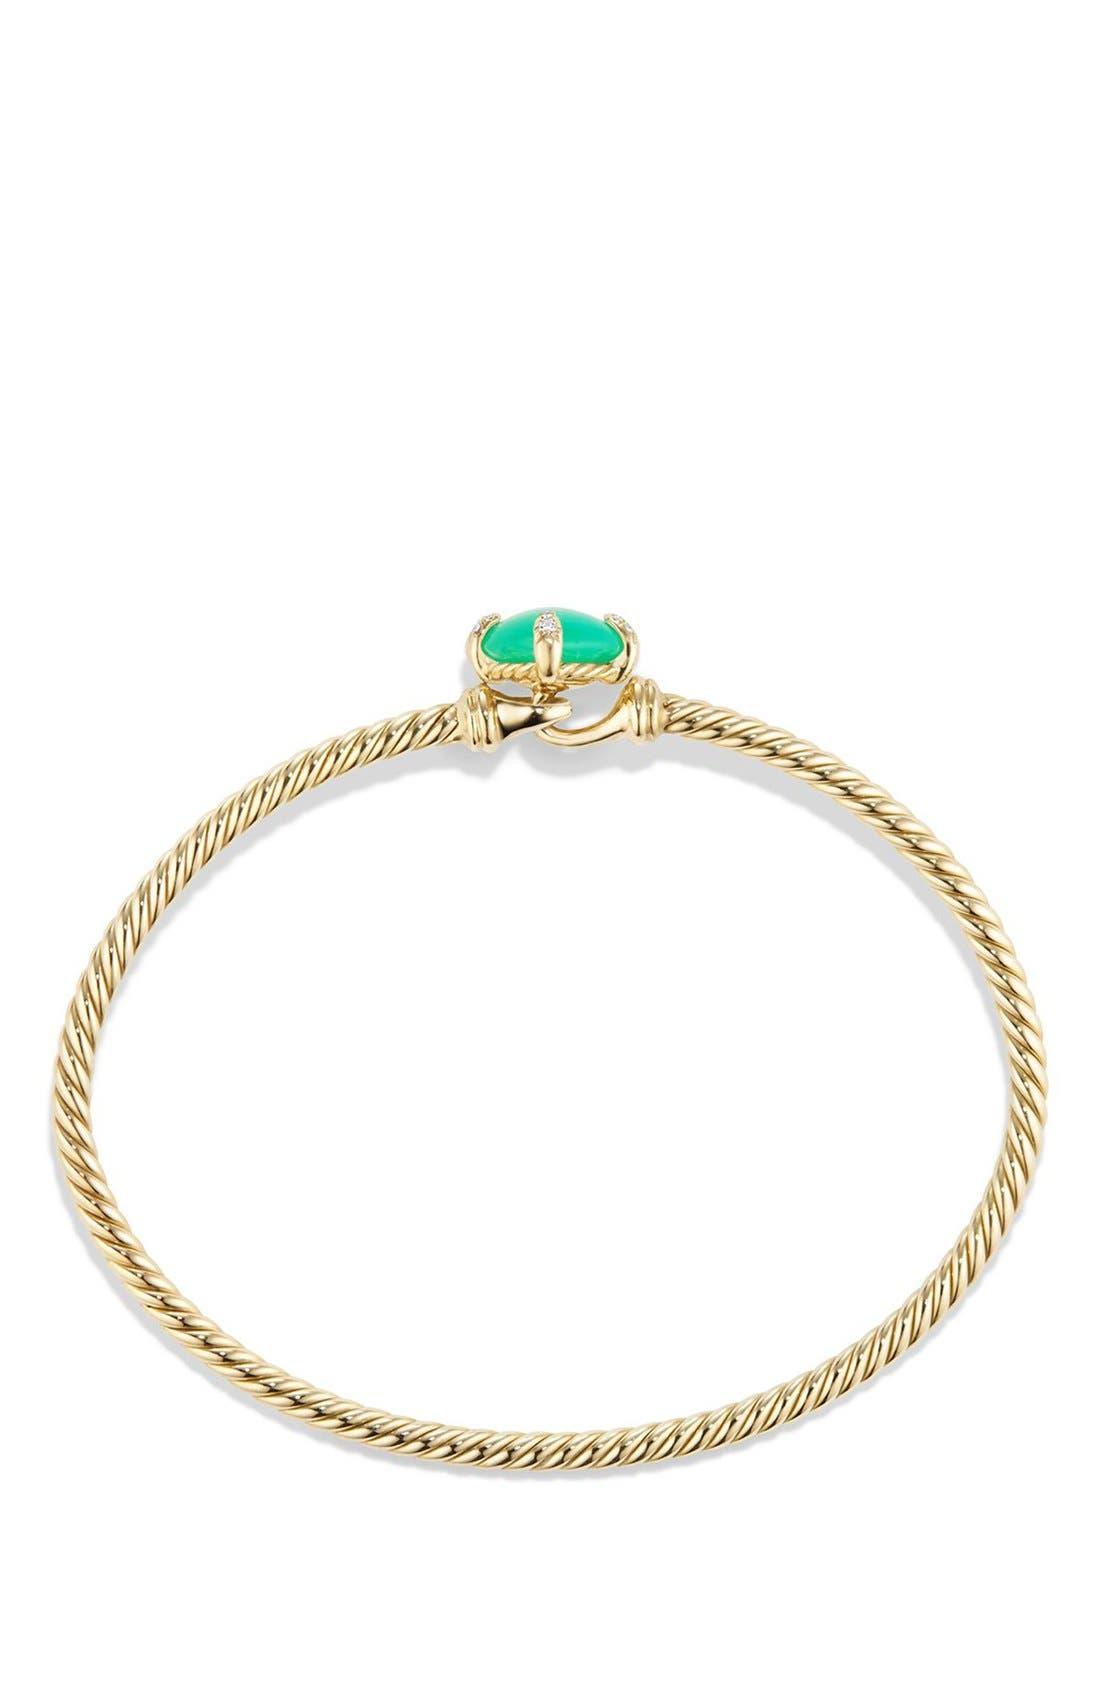 DAVID YURMAN, 'Châtelaine' Bracelet in 18K Gold with Diamonds, Alternate thumbnail 2, color, CHRYSOPRASE